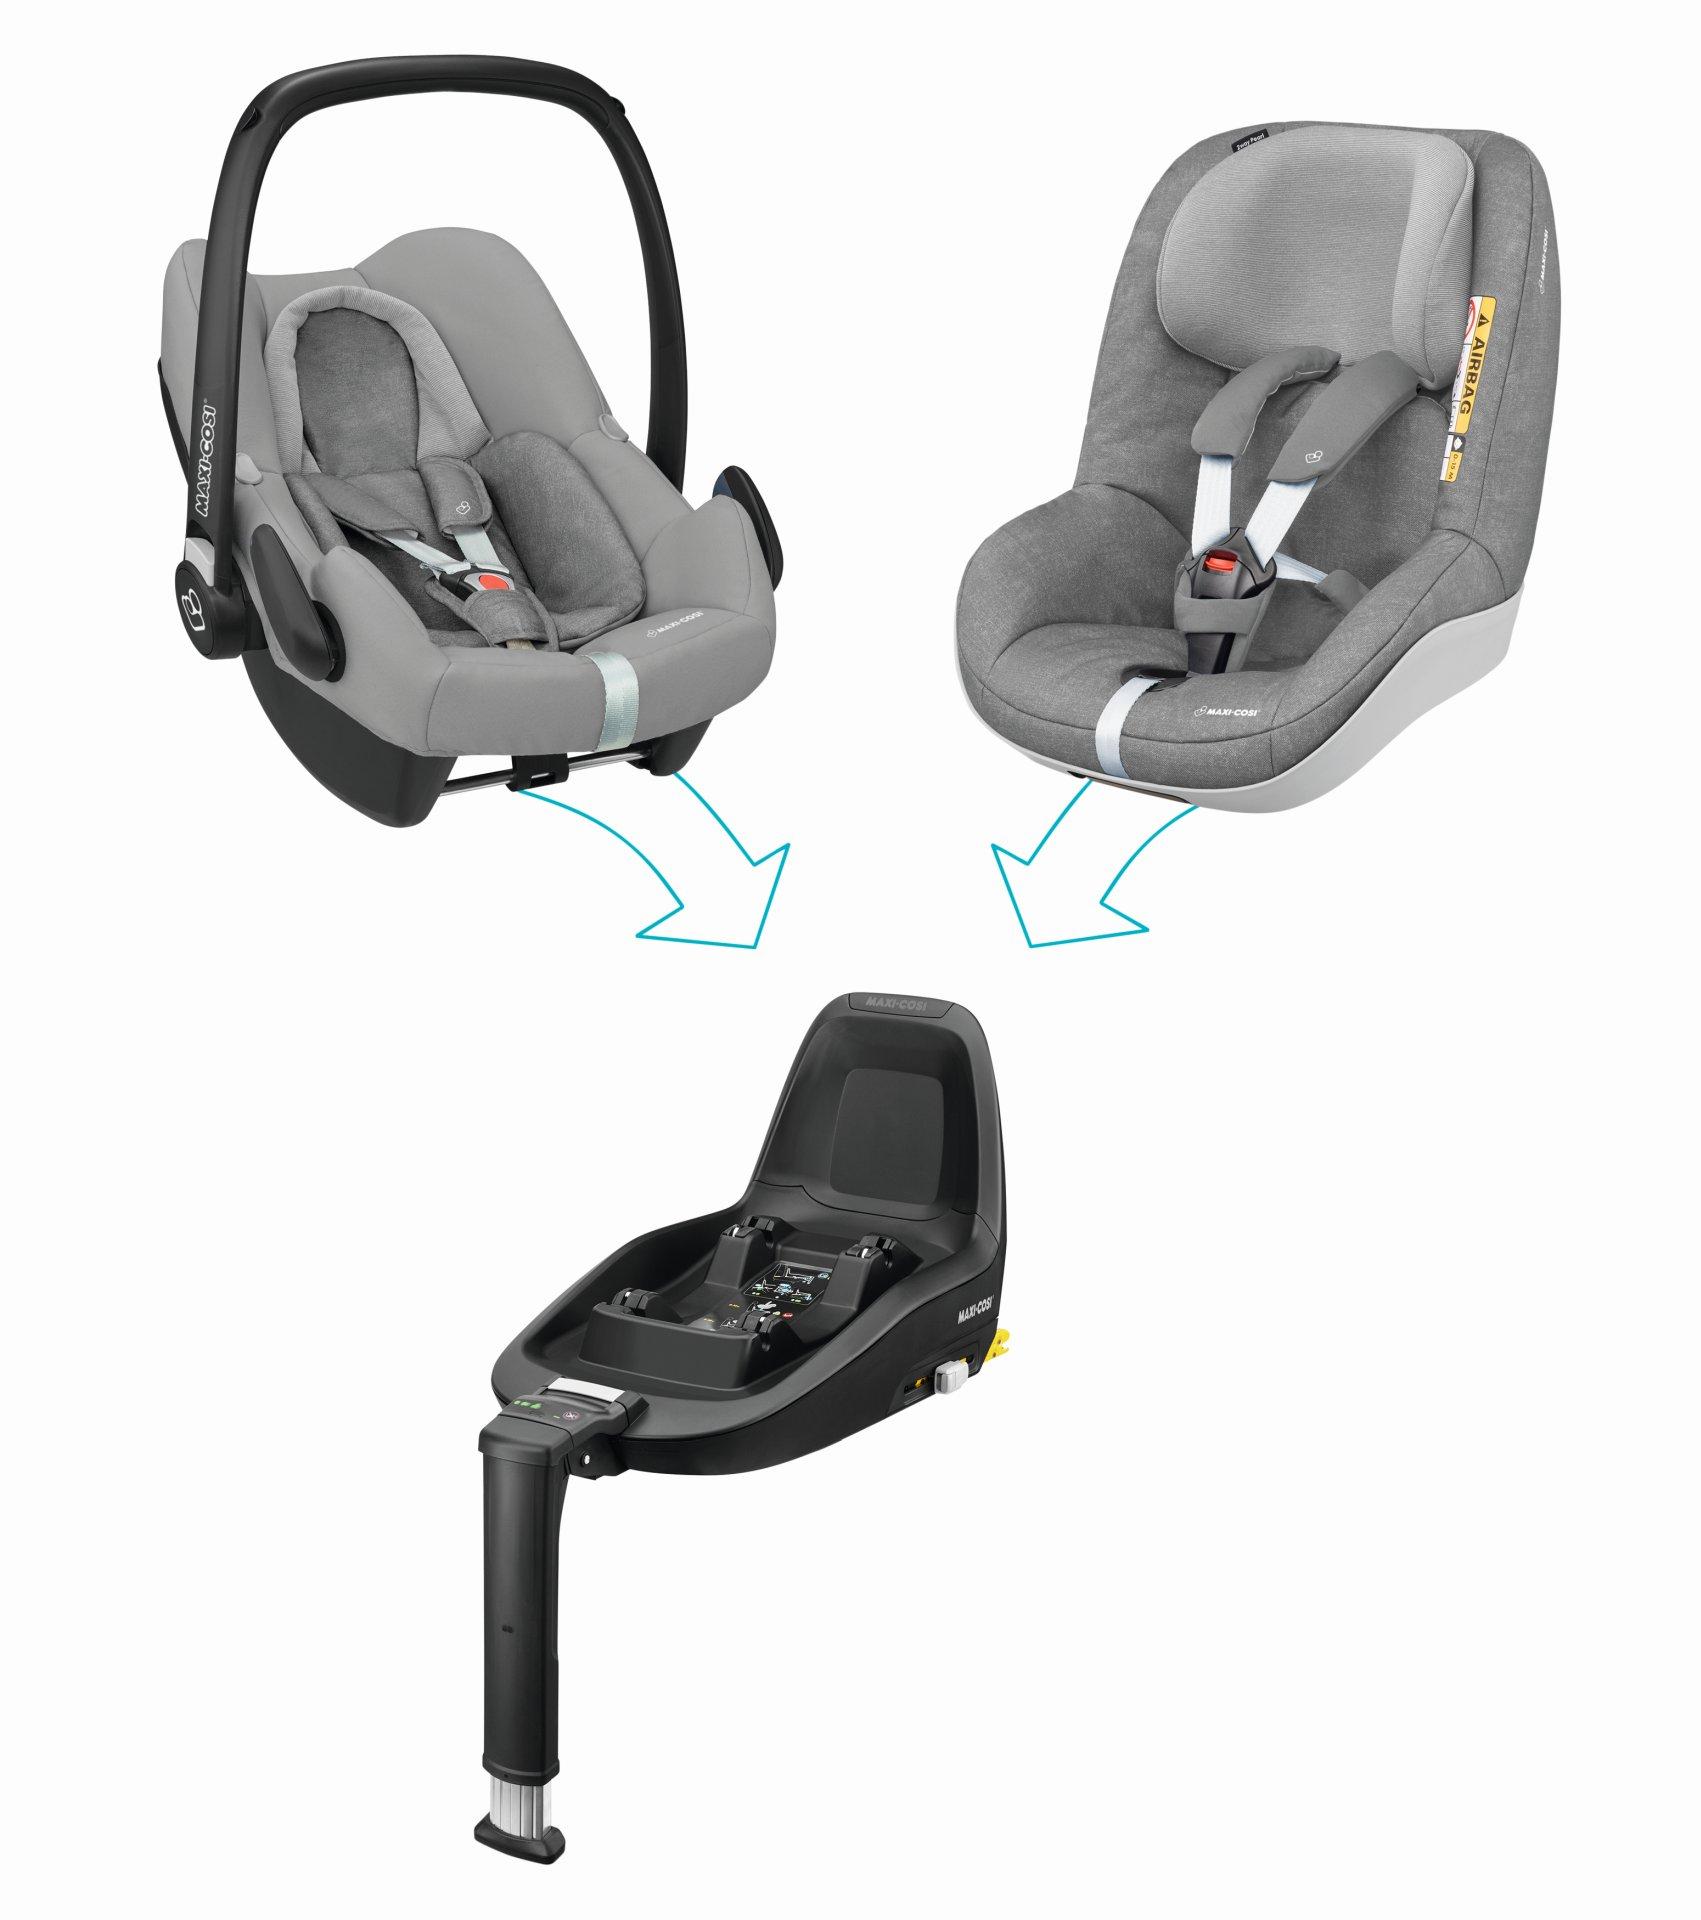 maxi cosi infant car seat rock 2019 nomad black buy at. Black Bedroom Furniture Sets. Home Design Ideas